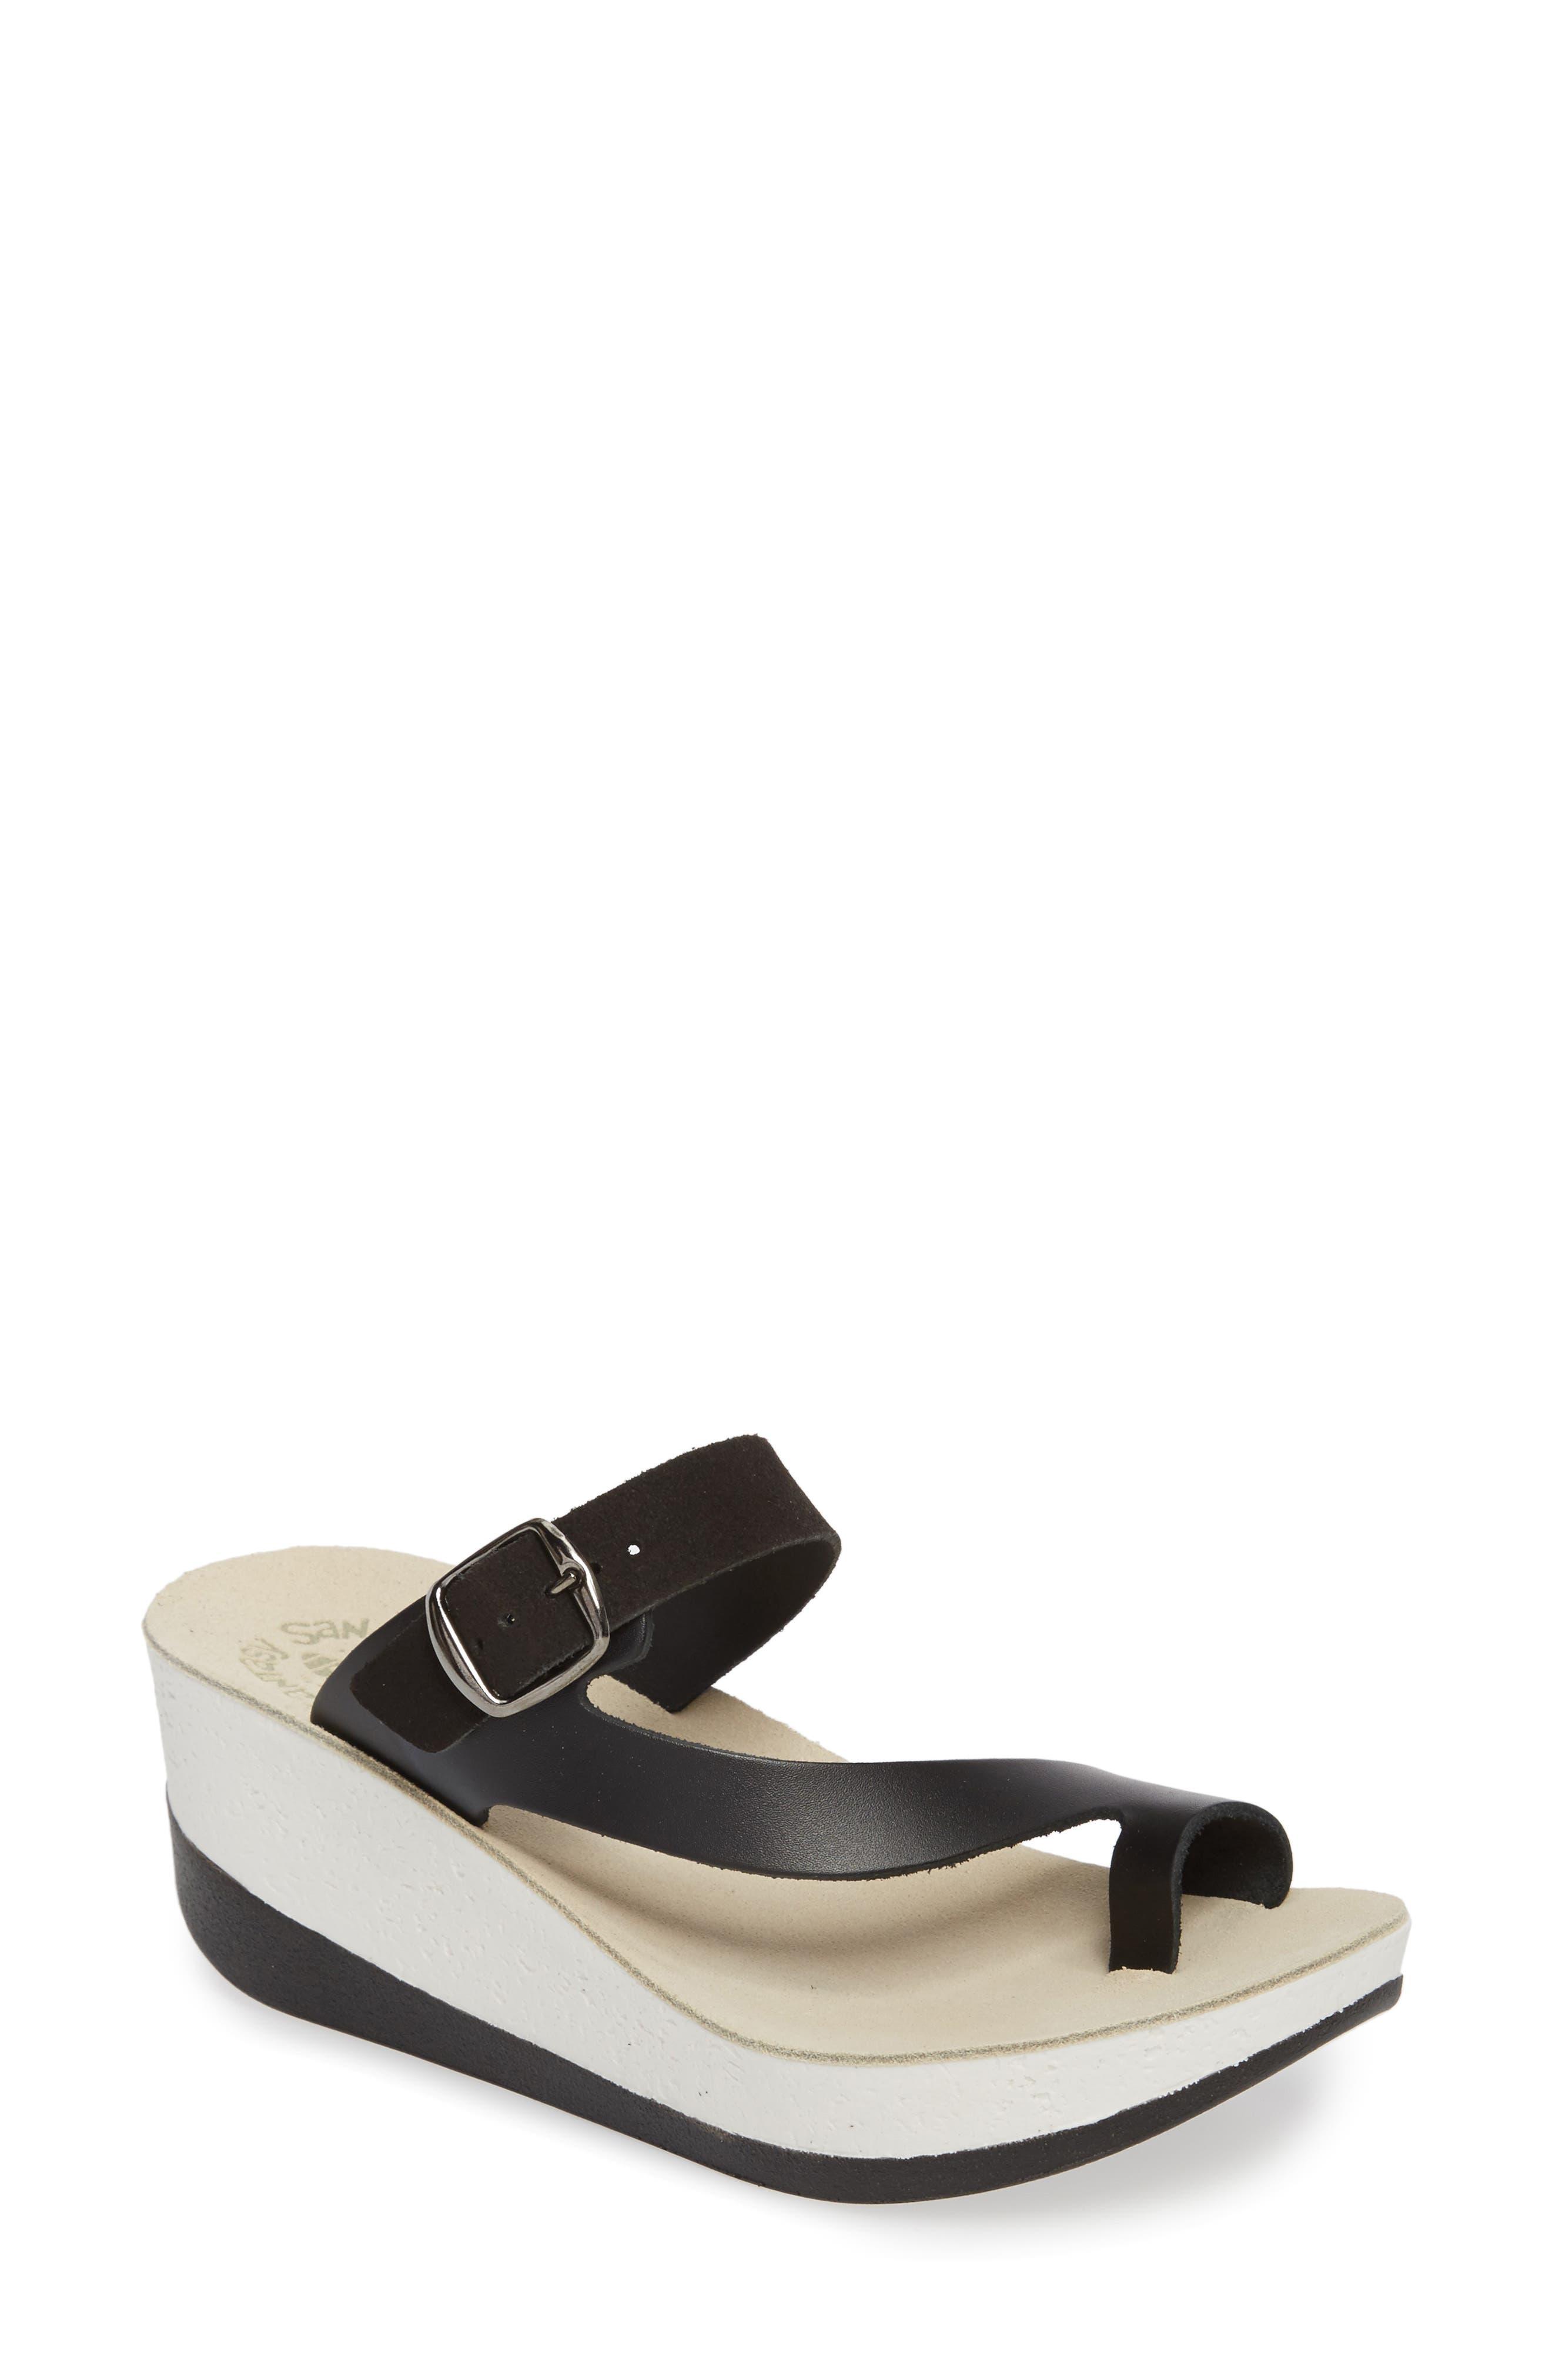 Felisa Wedge Sandal,                         Main,                         color, BLACK LEATHER